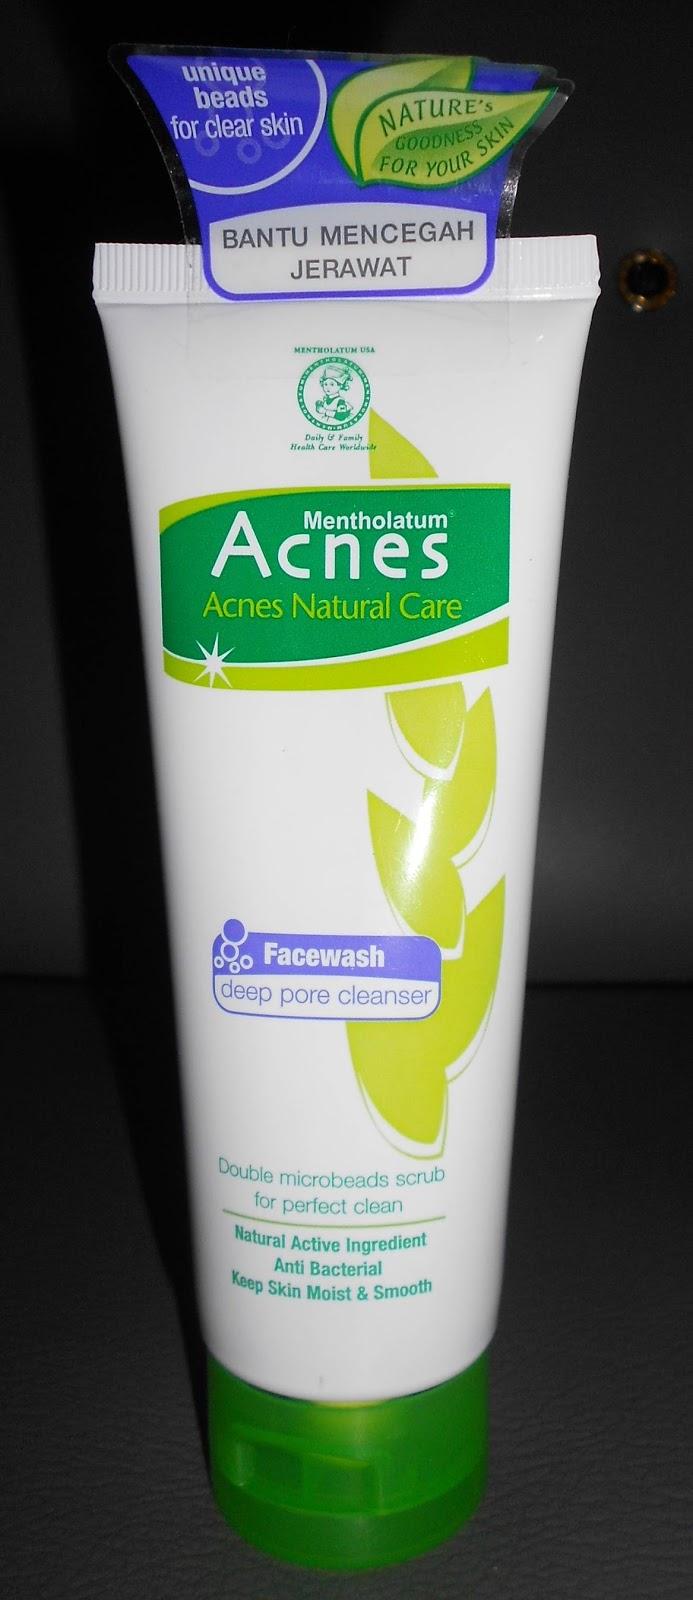 Review Acnes Facewash Deep Pore Cleanser Natural Care Face Wash Yogurt